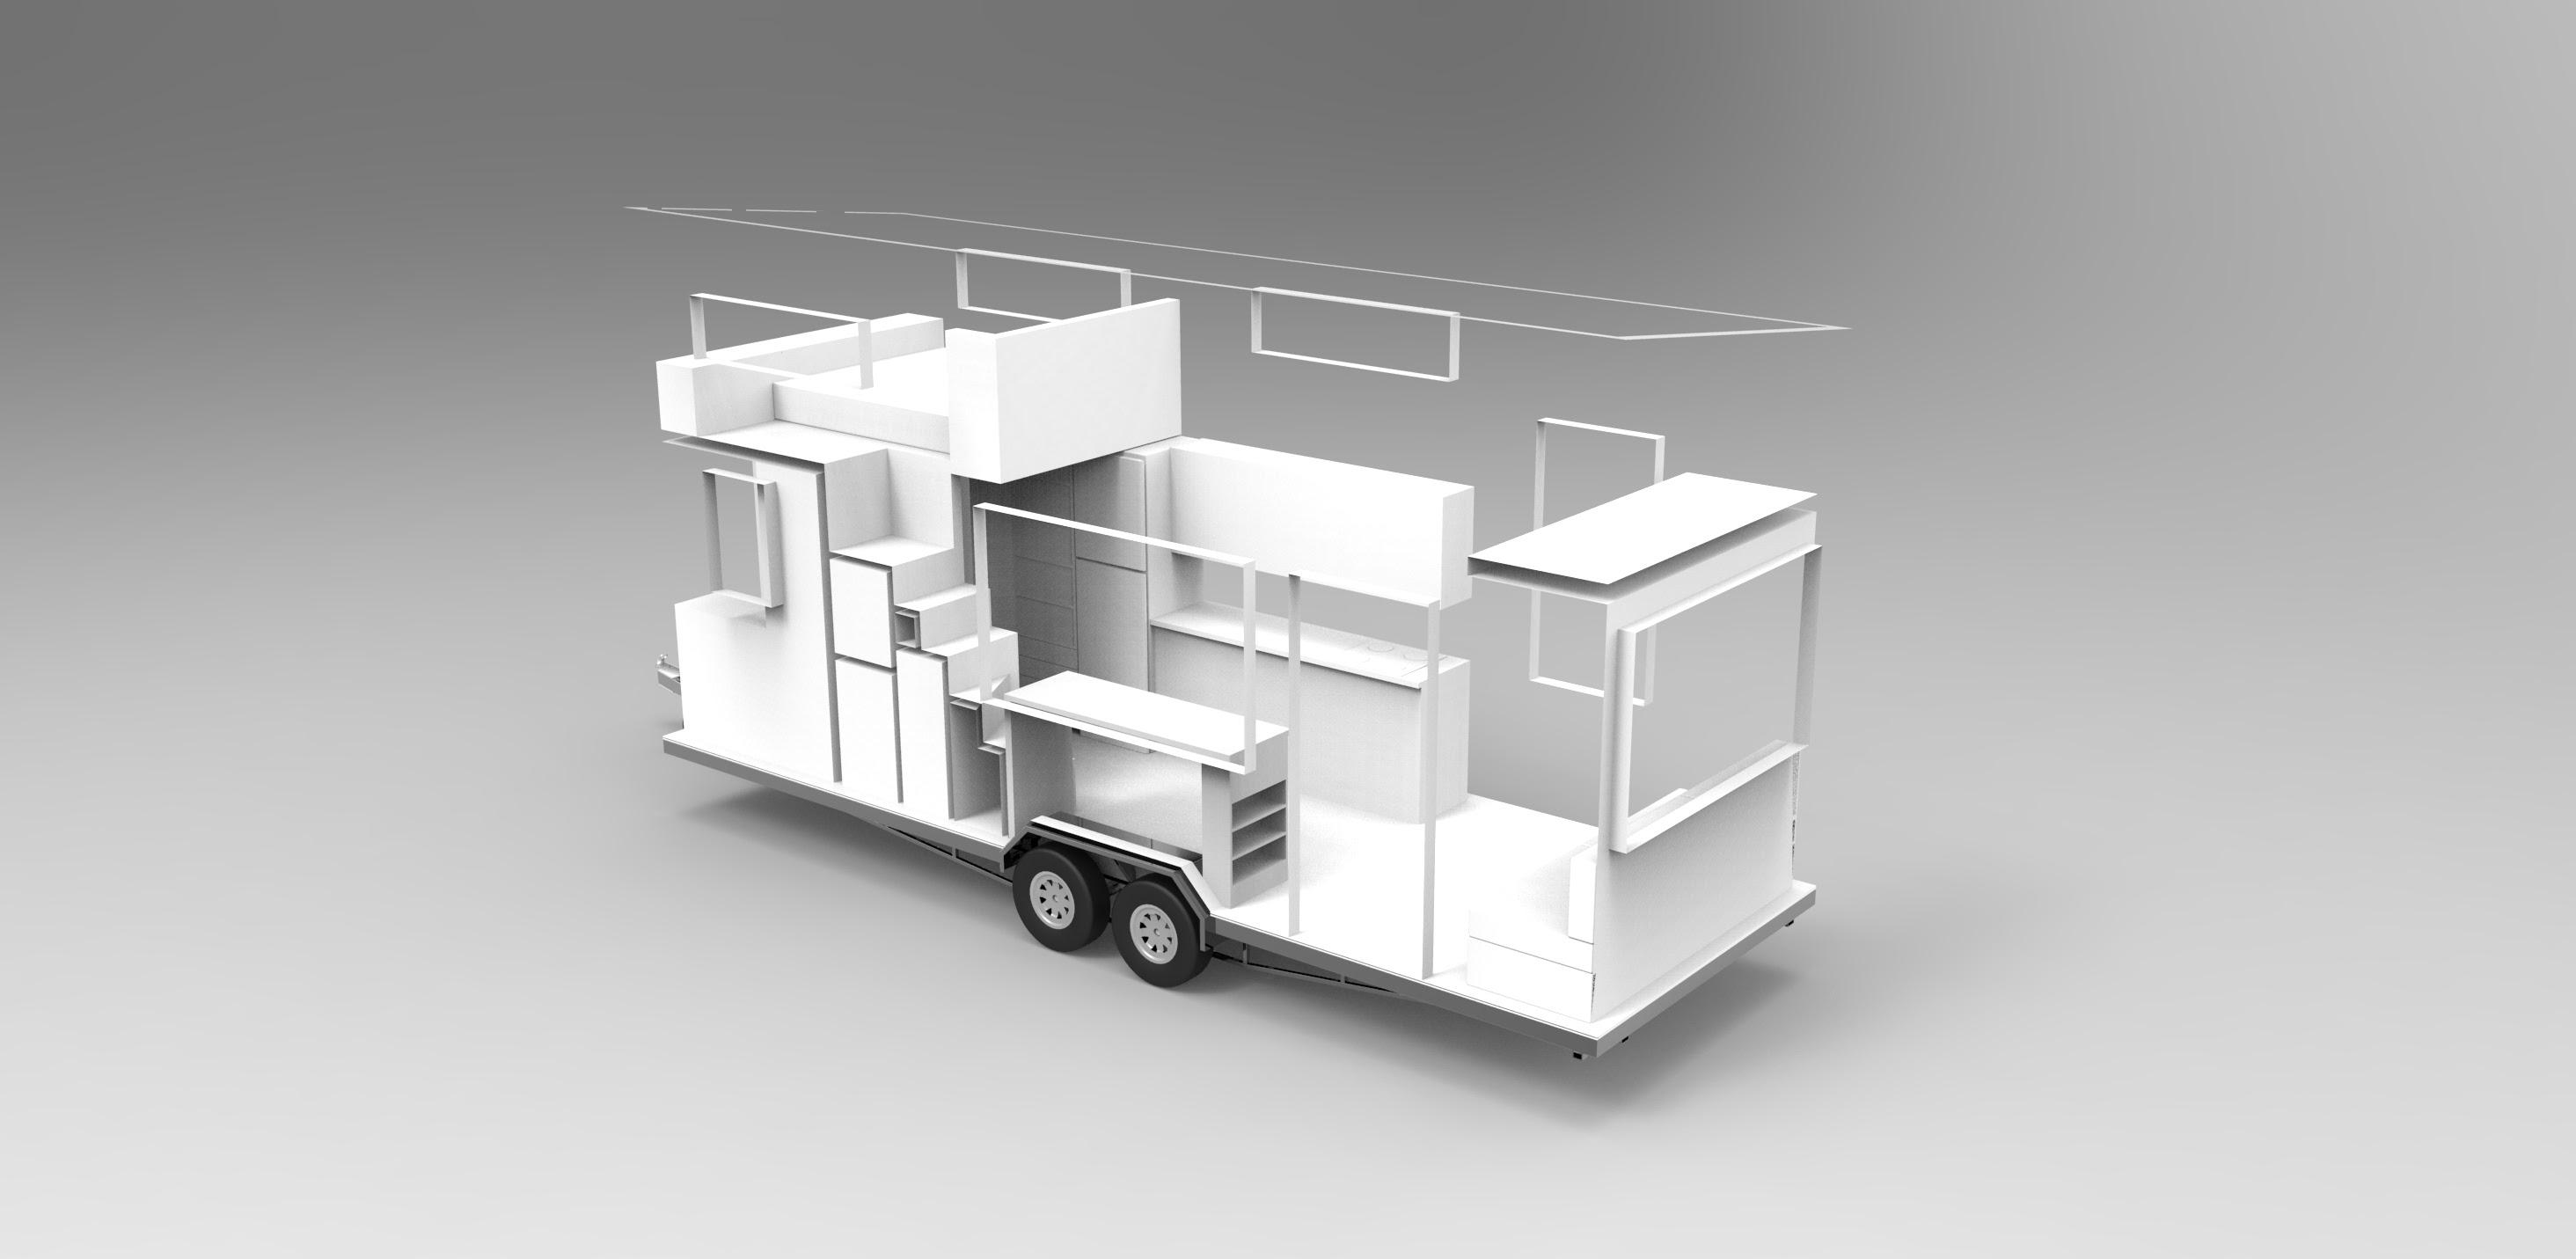 Living Small Christchurch New Zealand Design Completed By Tinka Design Ltd Tinka Design